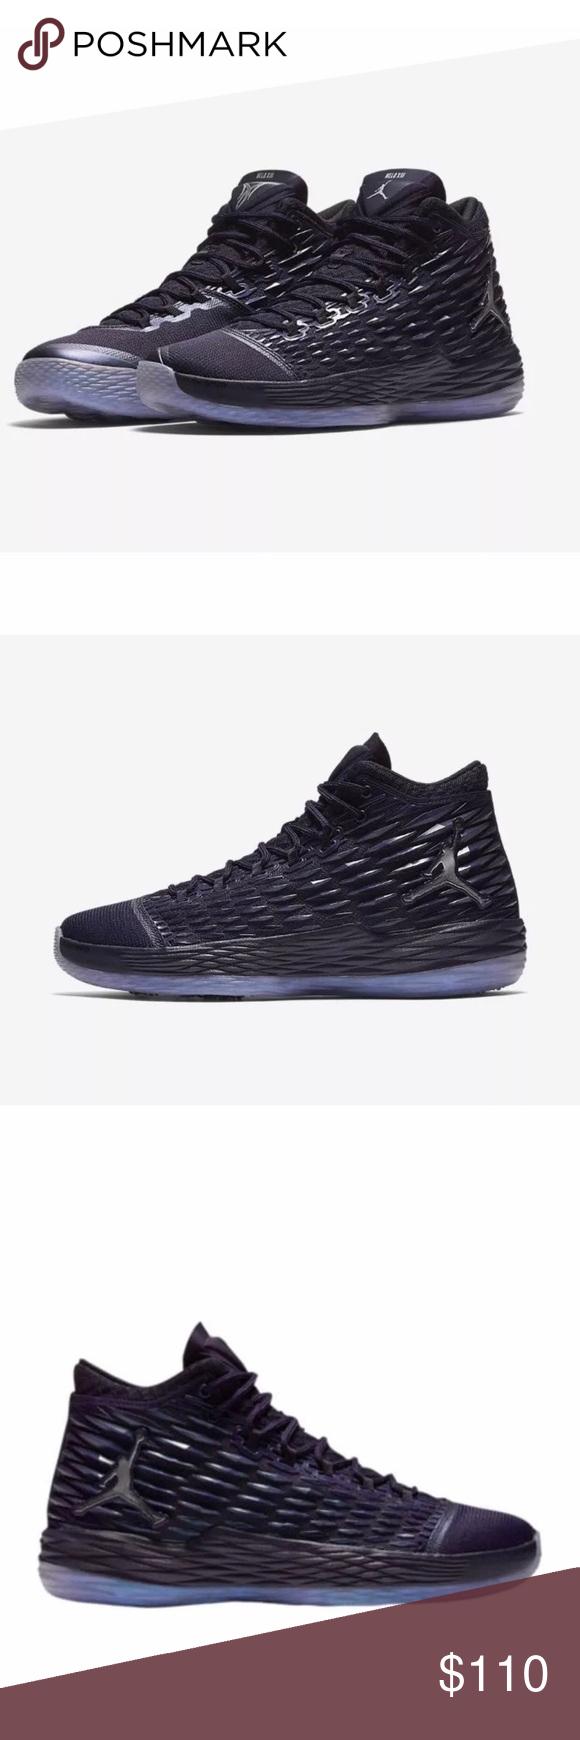 9c19964c1e48 Nike Air Jordan Melo M13 Men s Basketball Shoes Nike Air Jordan Melo M13  Men s Basketball Shoes